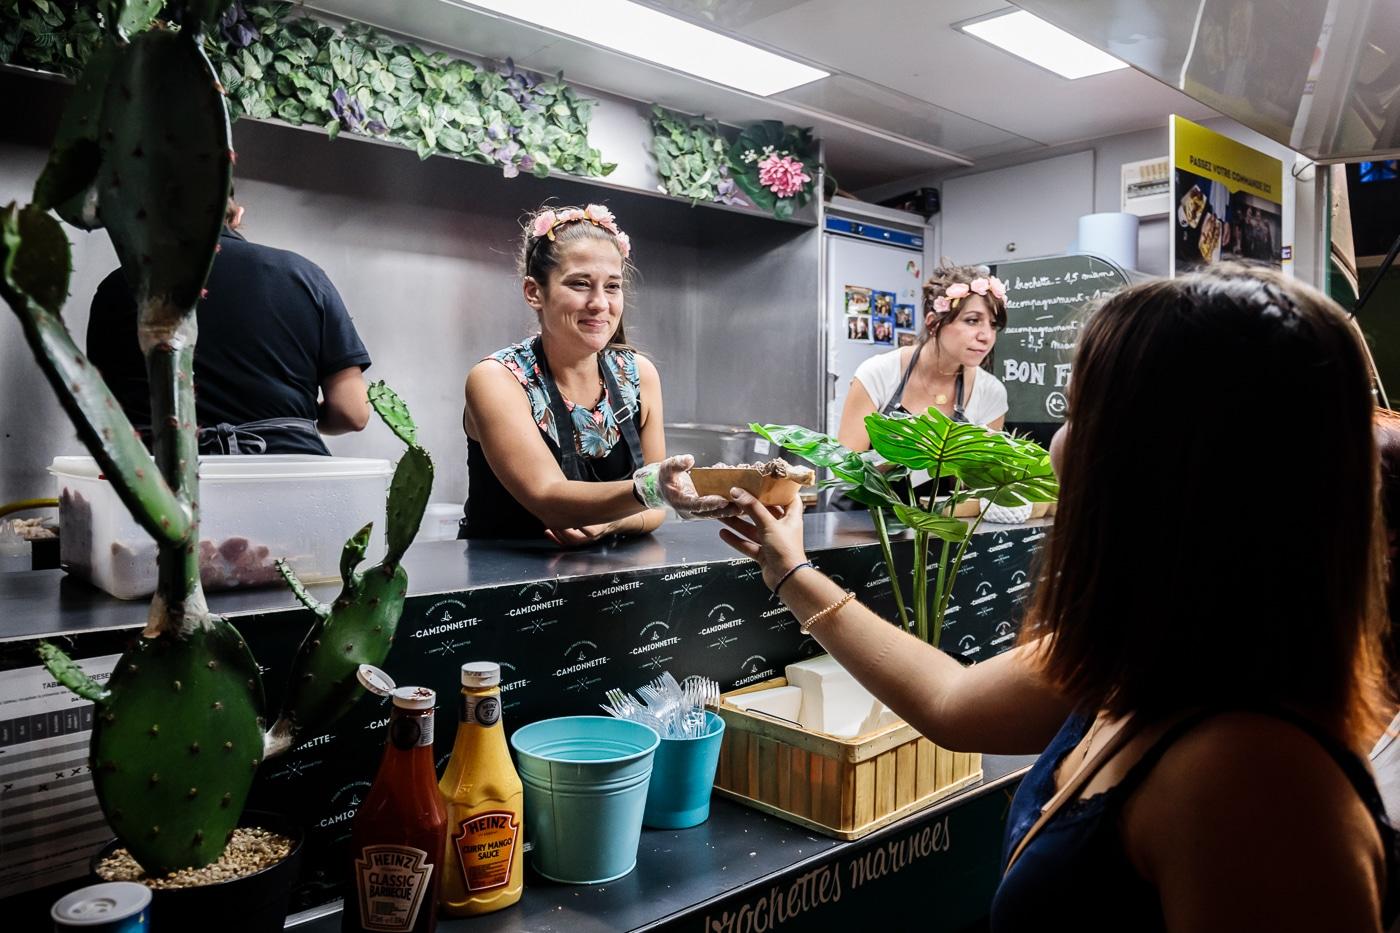 Rotation Food Trucks - Service - Nomad Kitchens